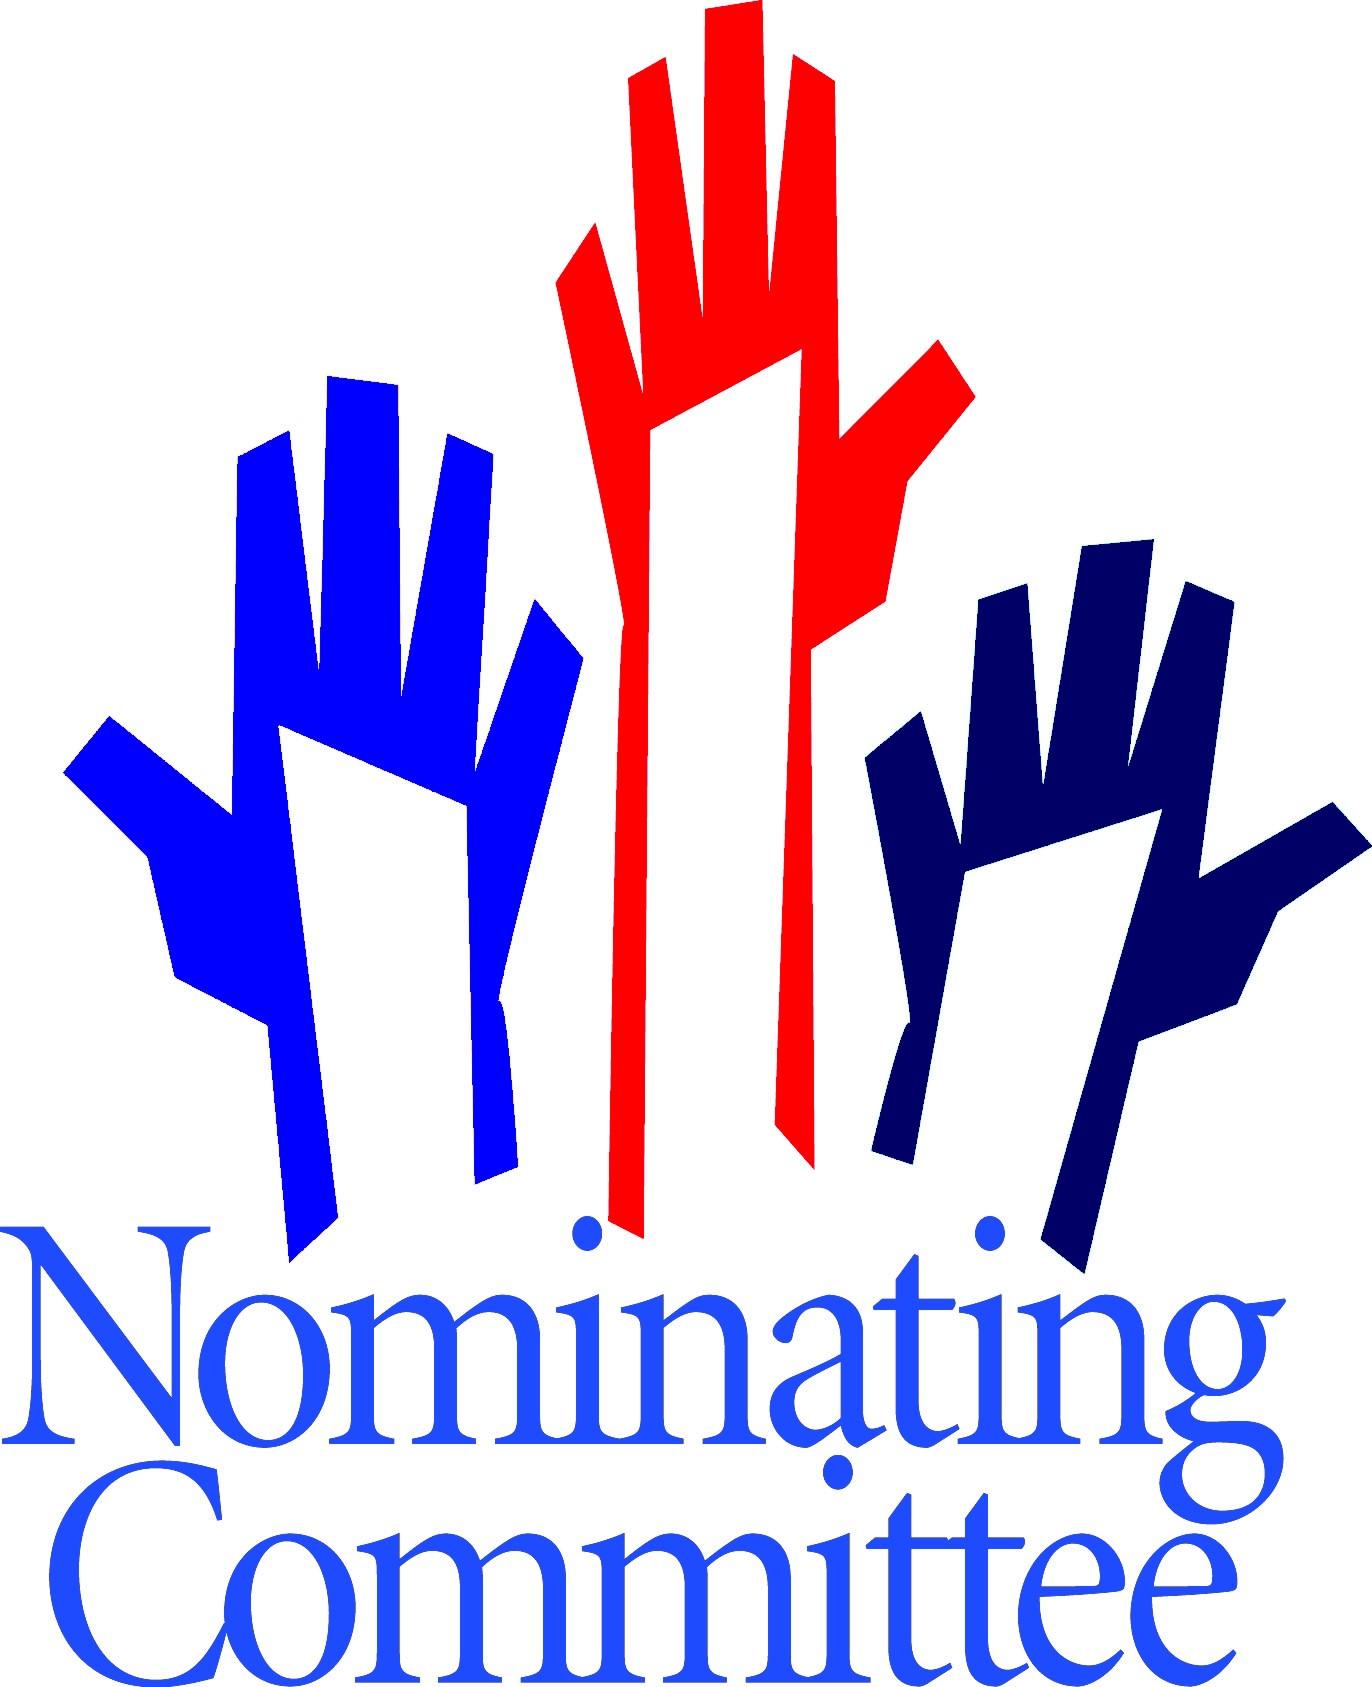 Panels clipart nomination Animated Nominating committee nominating committee